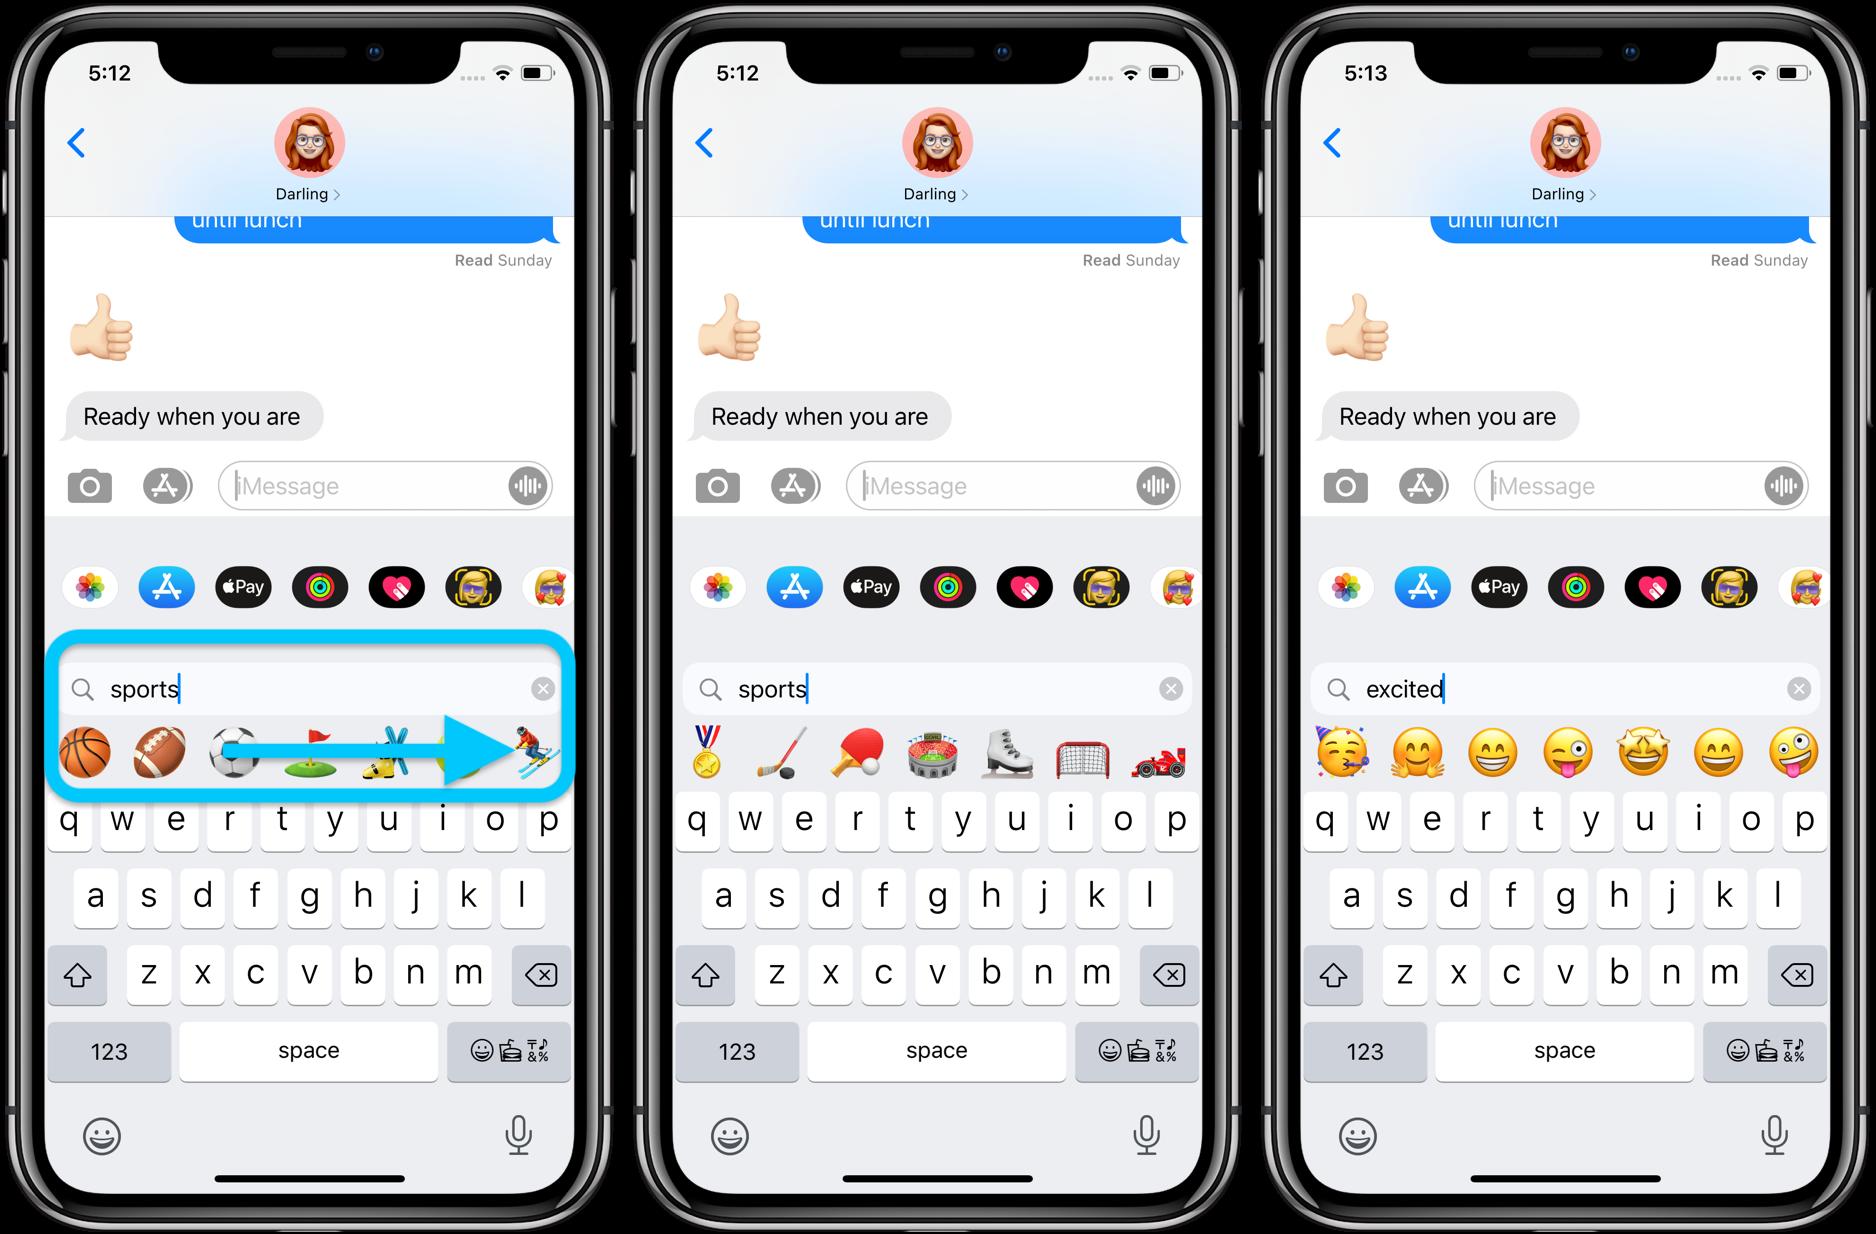 How to use iPhone emoji search iOS 14 walkthrough 2